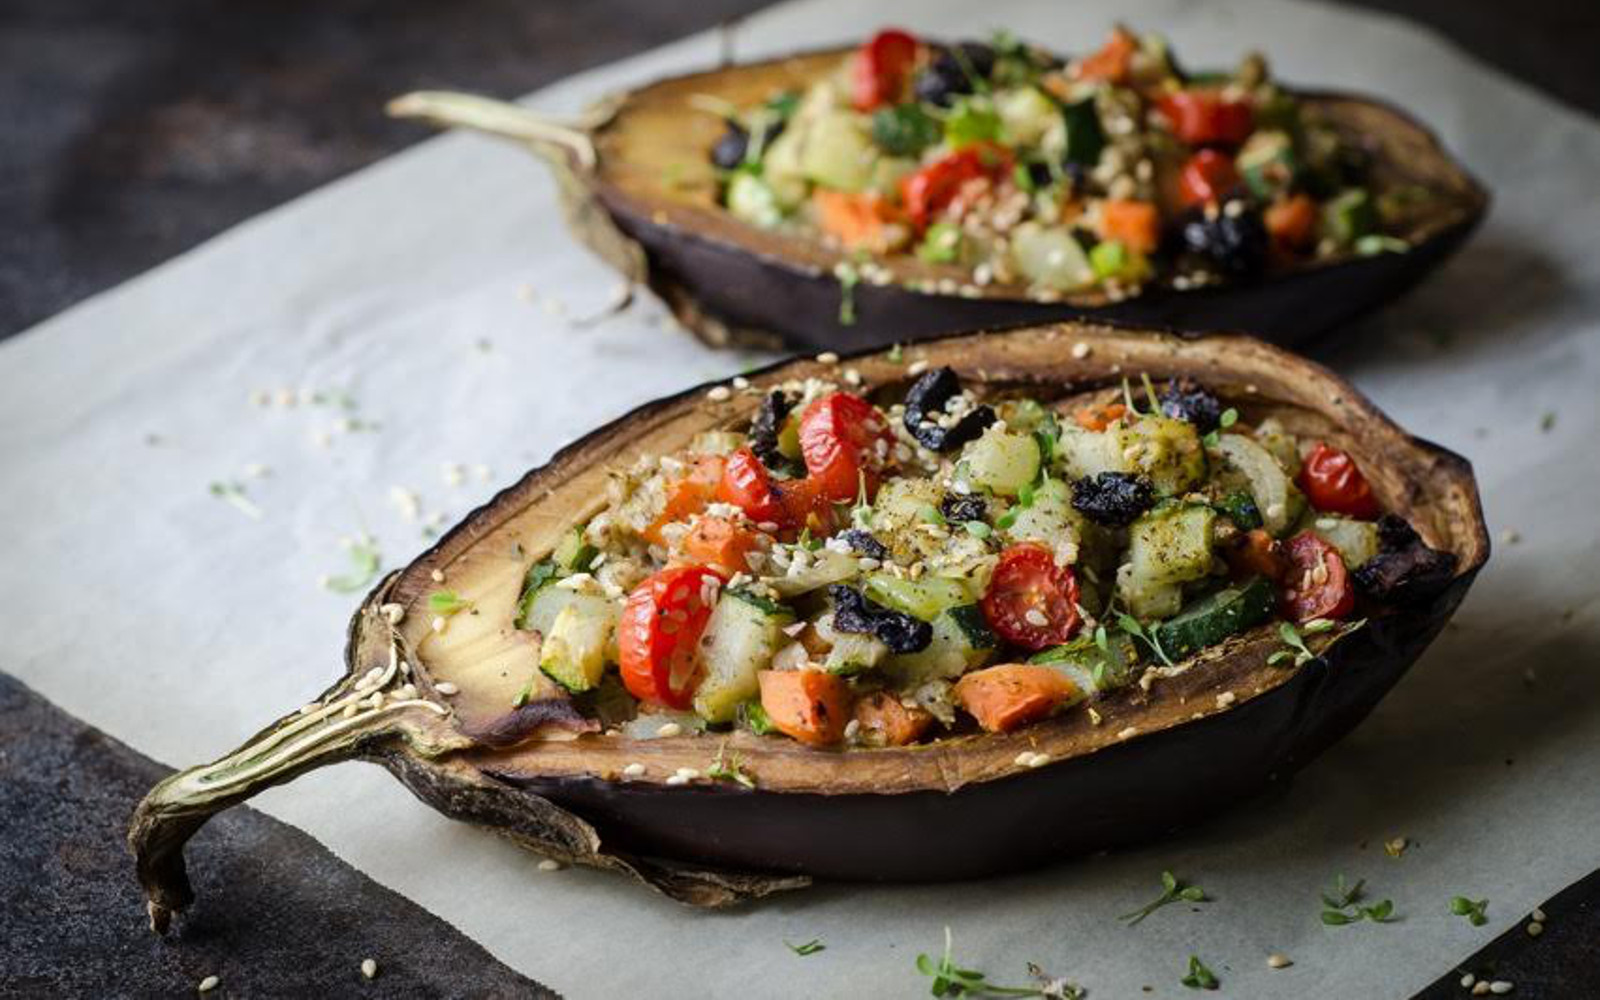 Vegetable-Stuffed Baked Eggplant